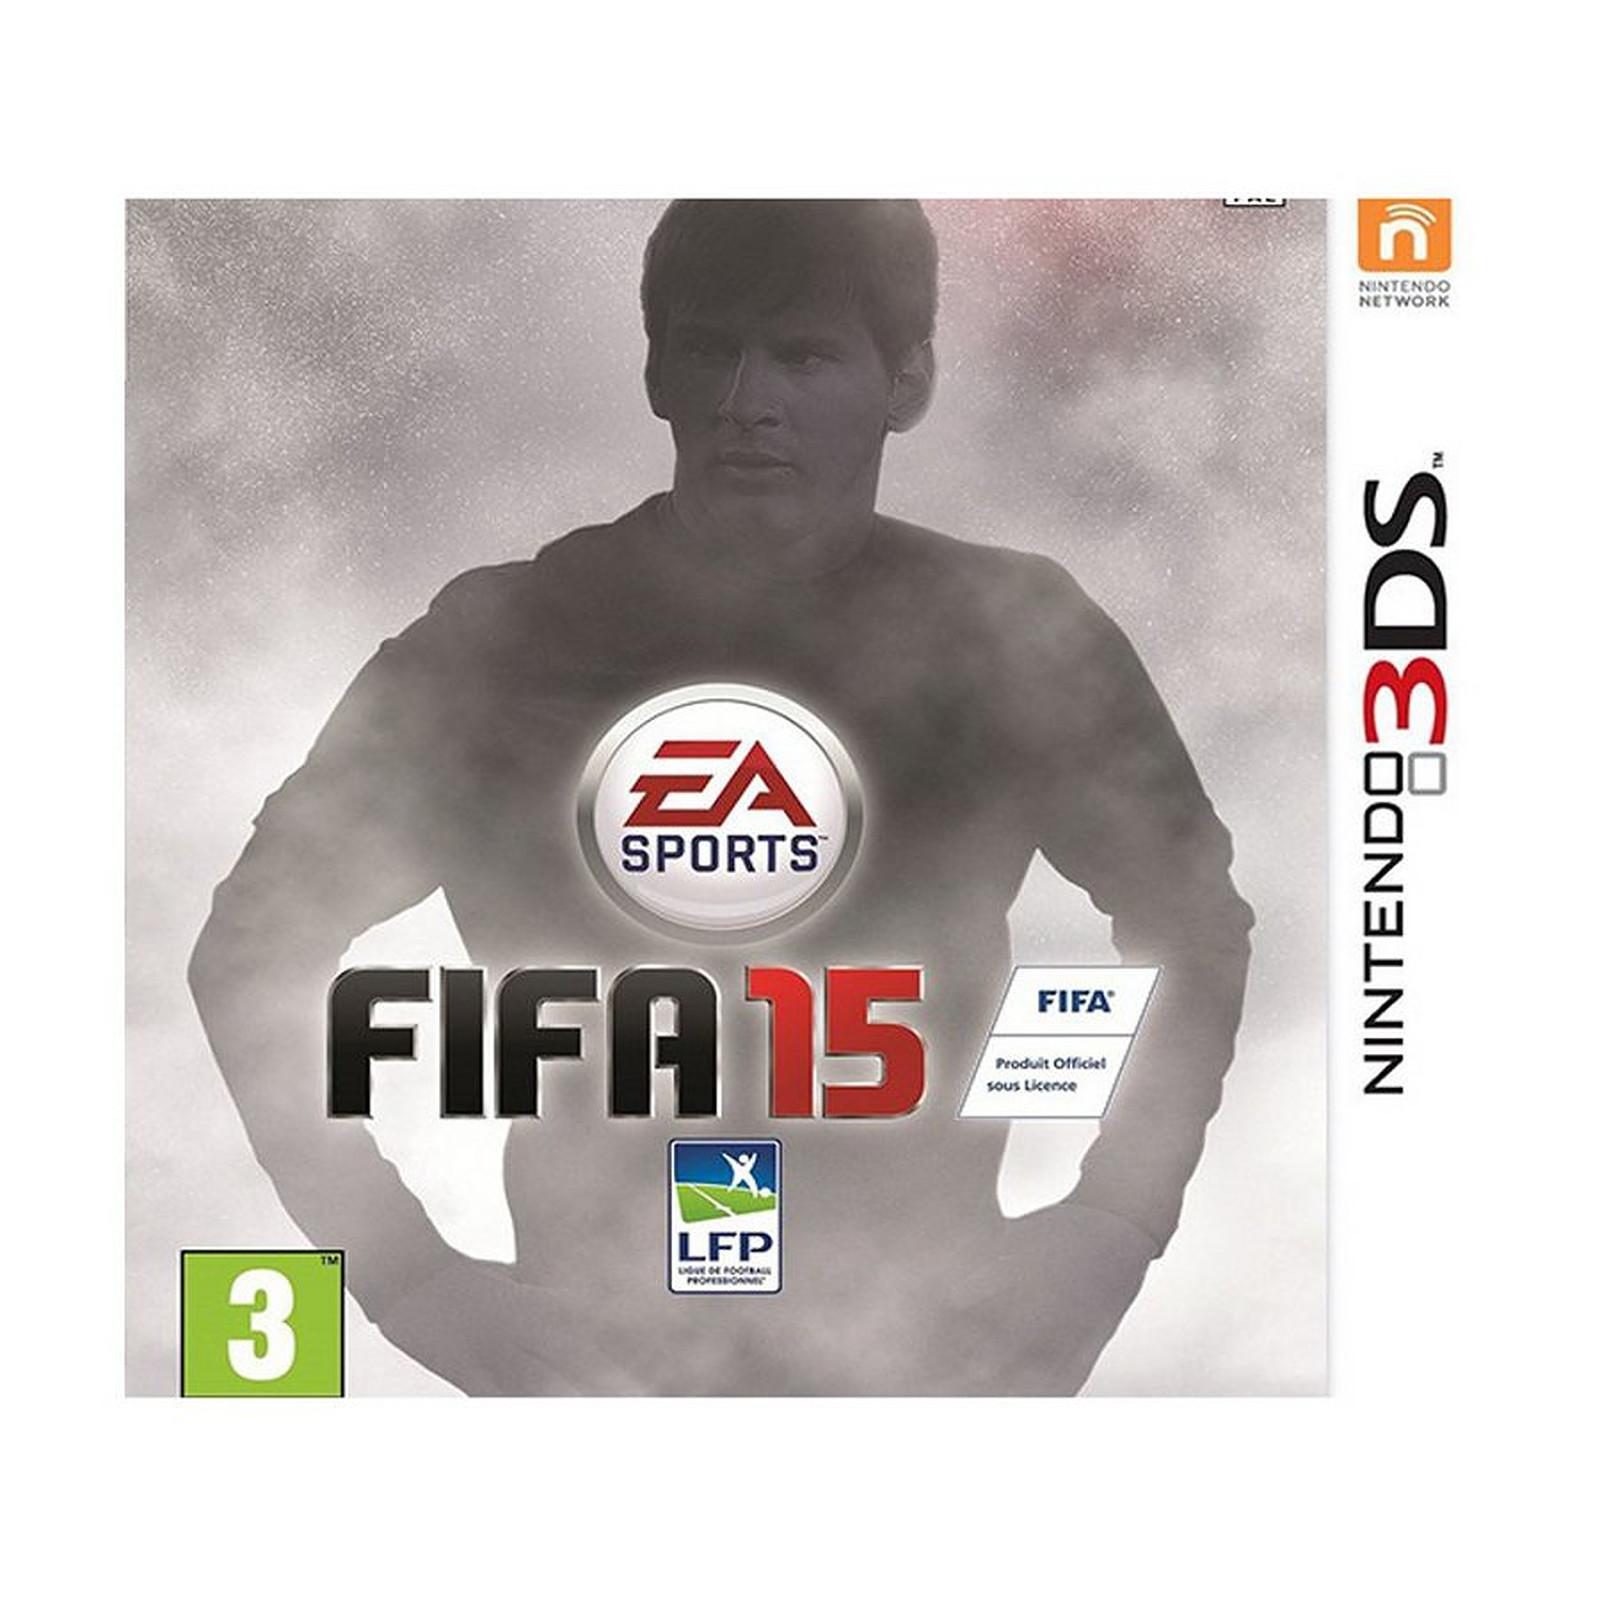 FIFA 15 (Nintendo 3DS/2DS)